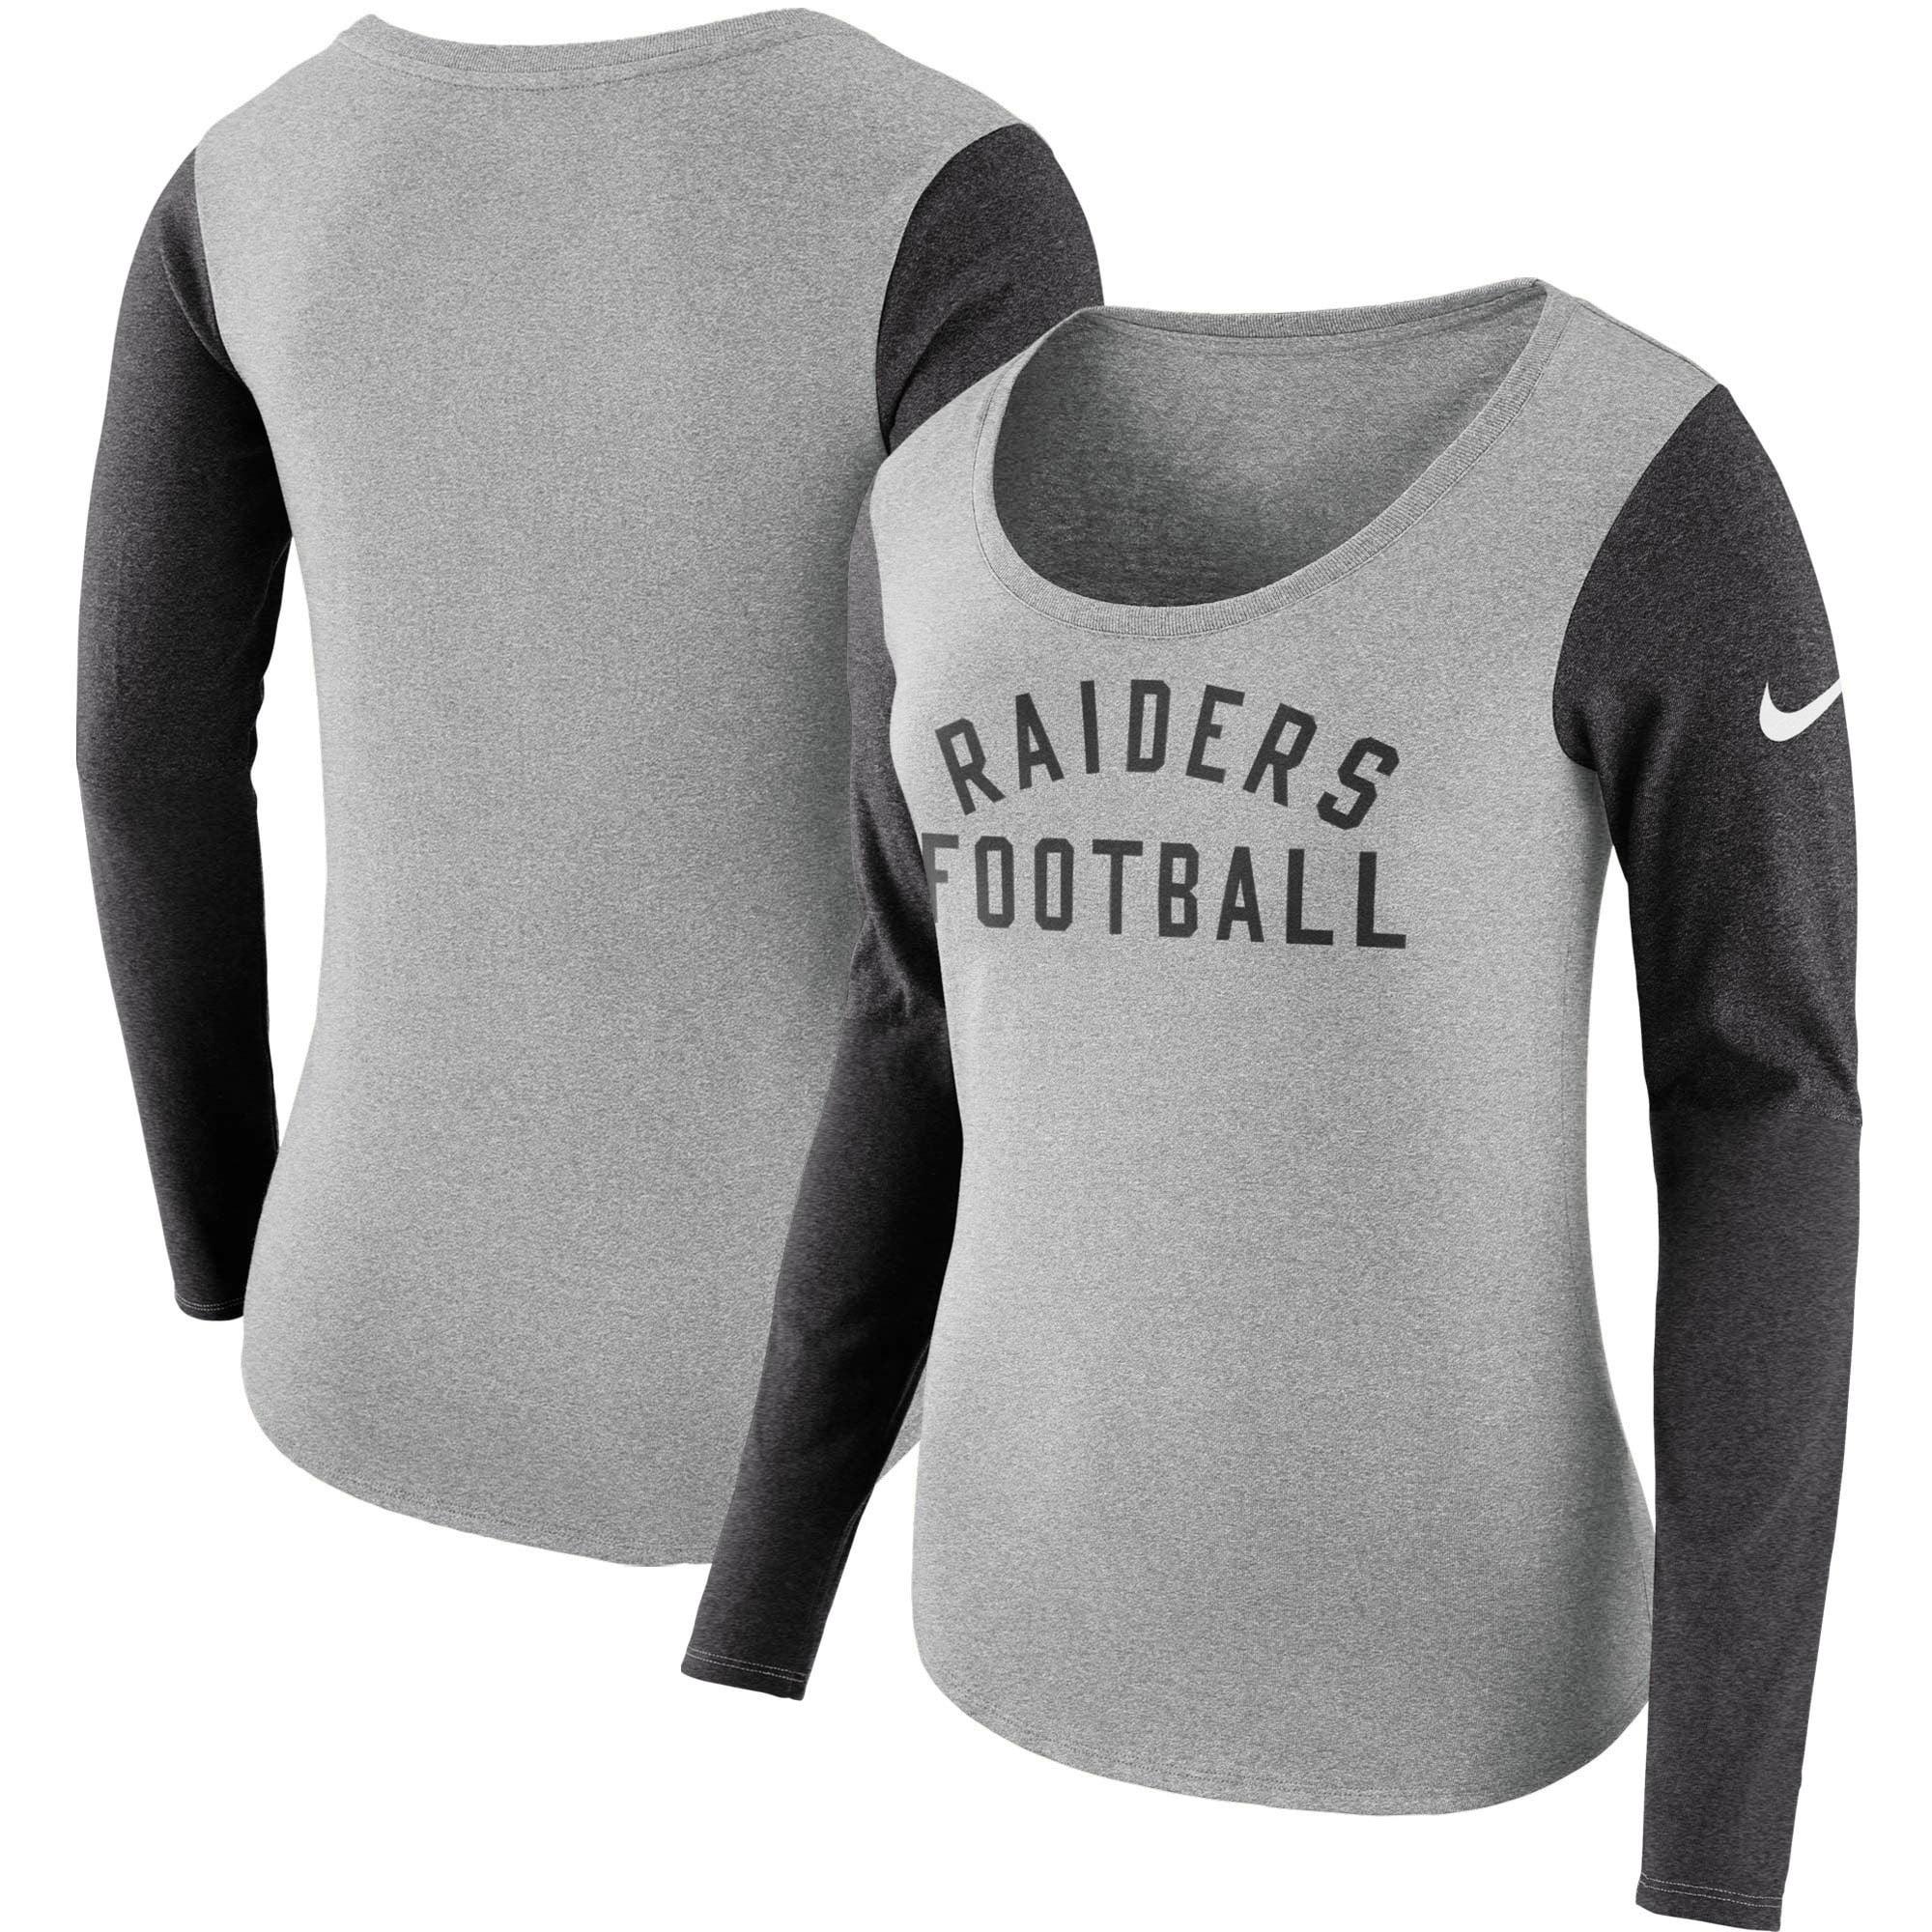 Oakland Raiders Nike Women's Modern Arch Tri-Blend Long Sleeve T-Shirt - Heathered Gray